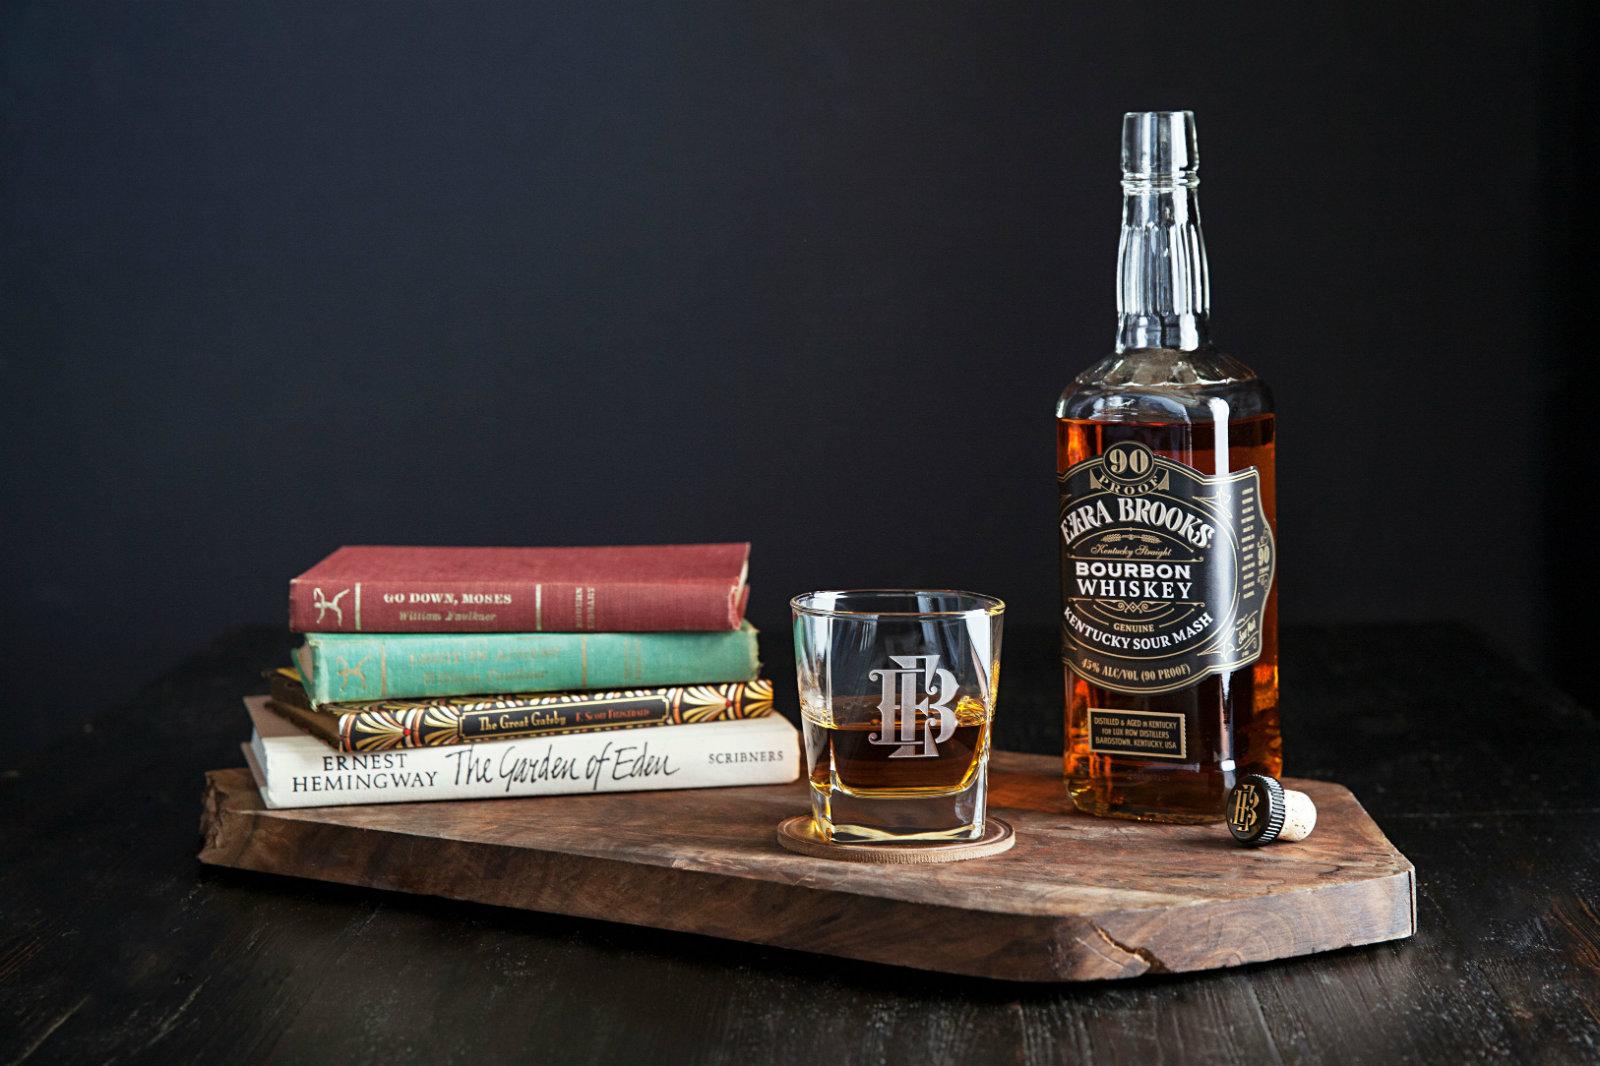 Ezra Brooks bourbon with stack of books